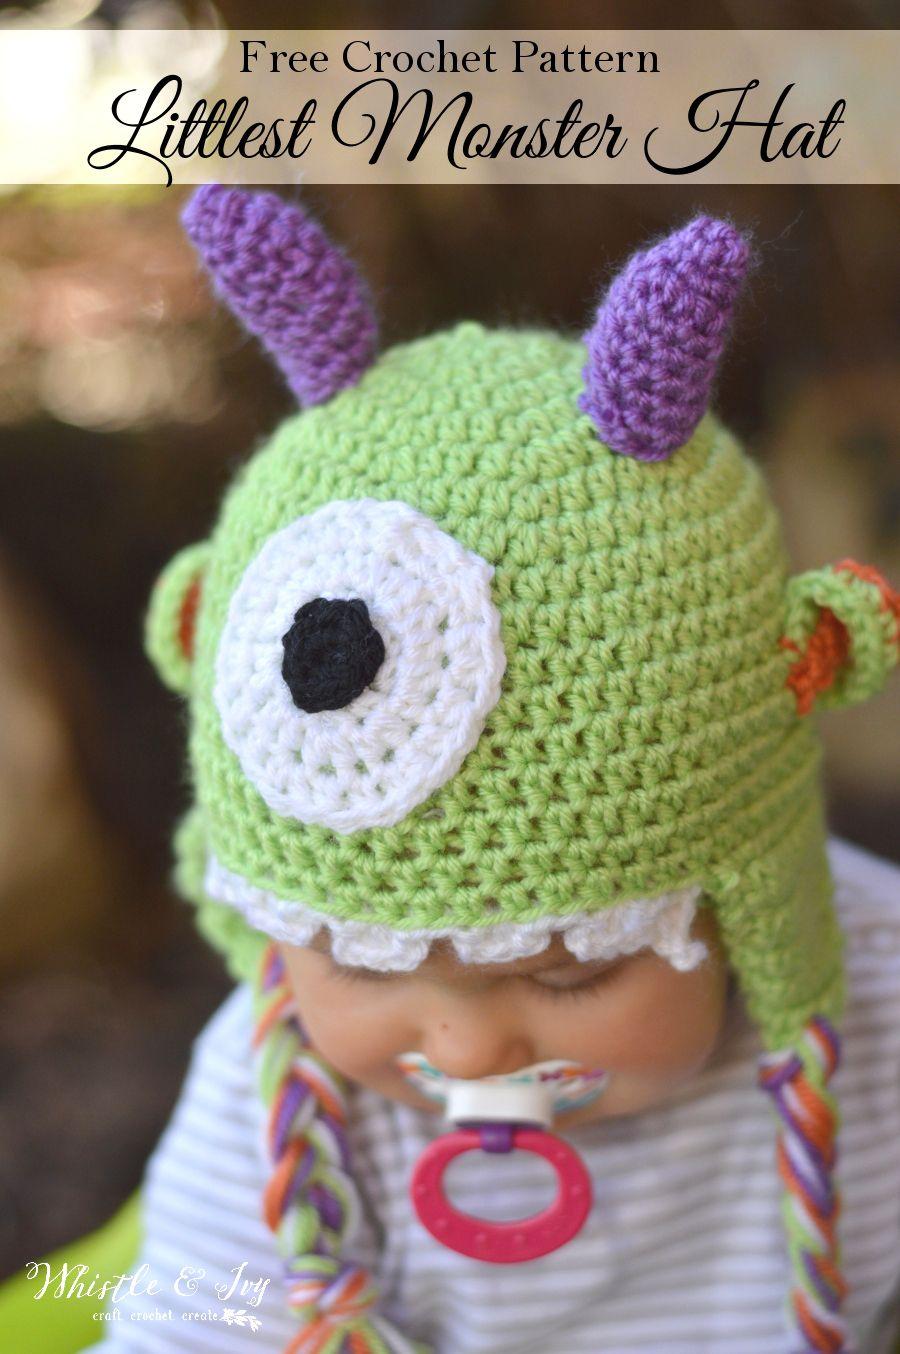 Littlest Monster Crochet Baby Hat | Crocheted baby hats, Baby hats ...